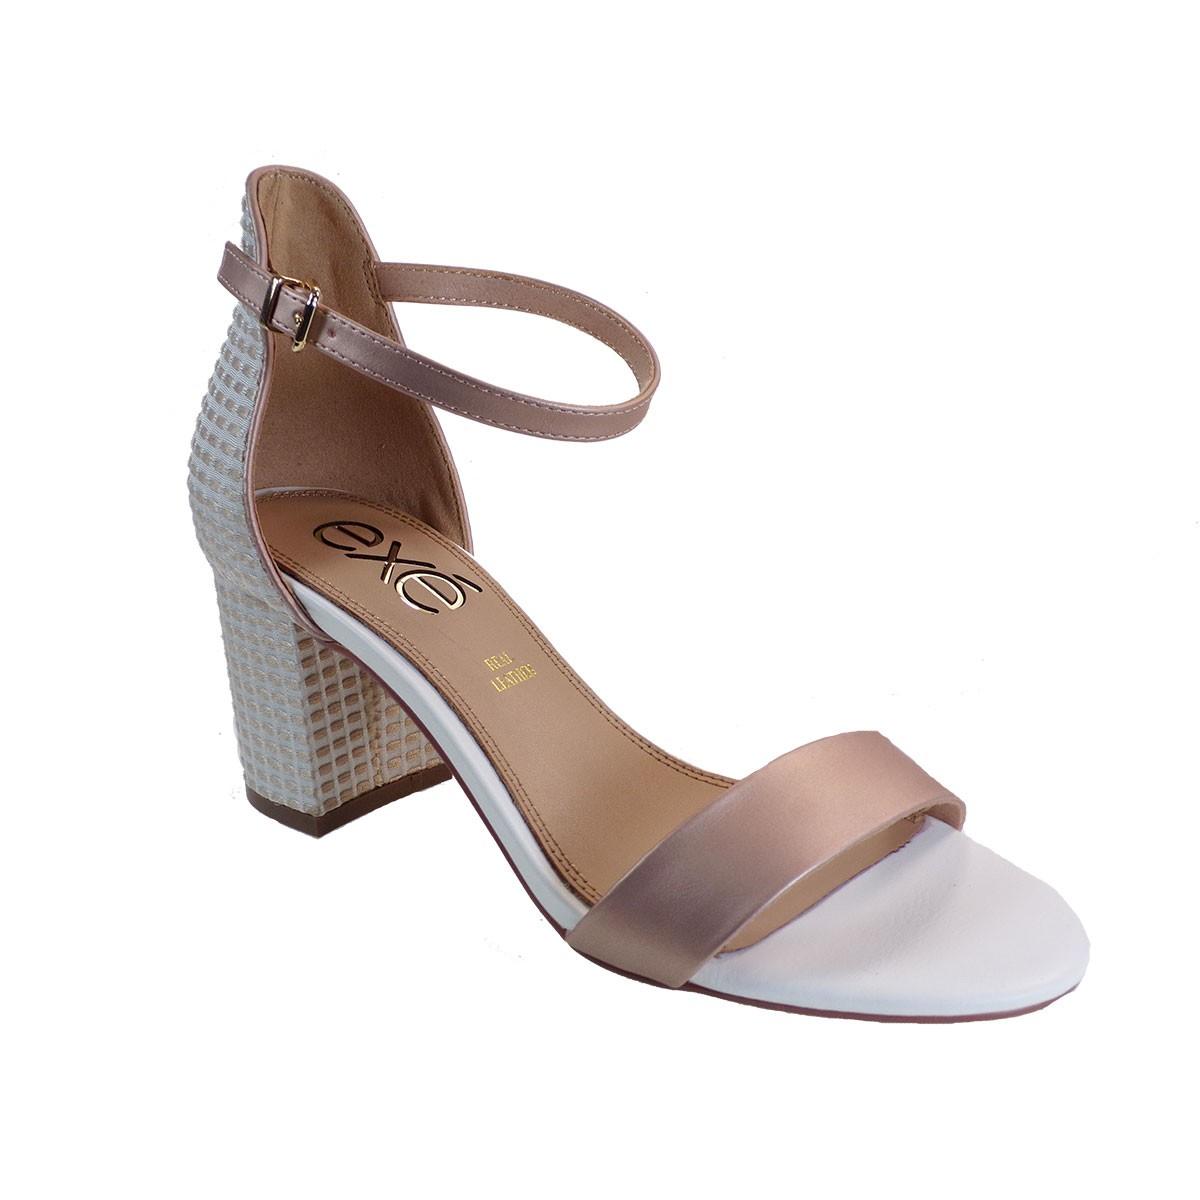 EXE Shoes Πέδιλα Γυναικεία ADELE-353 Nude Μεταλλικό Λευκό M4700353401N